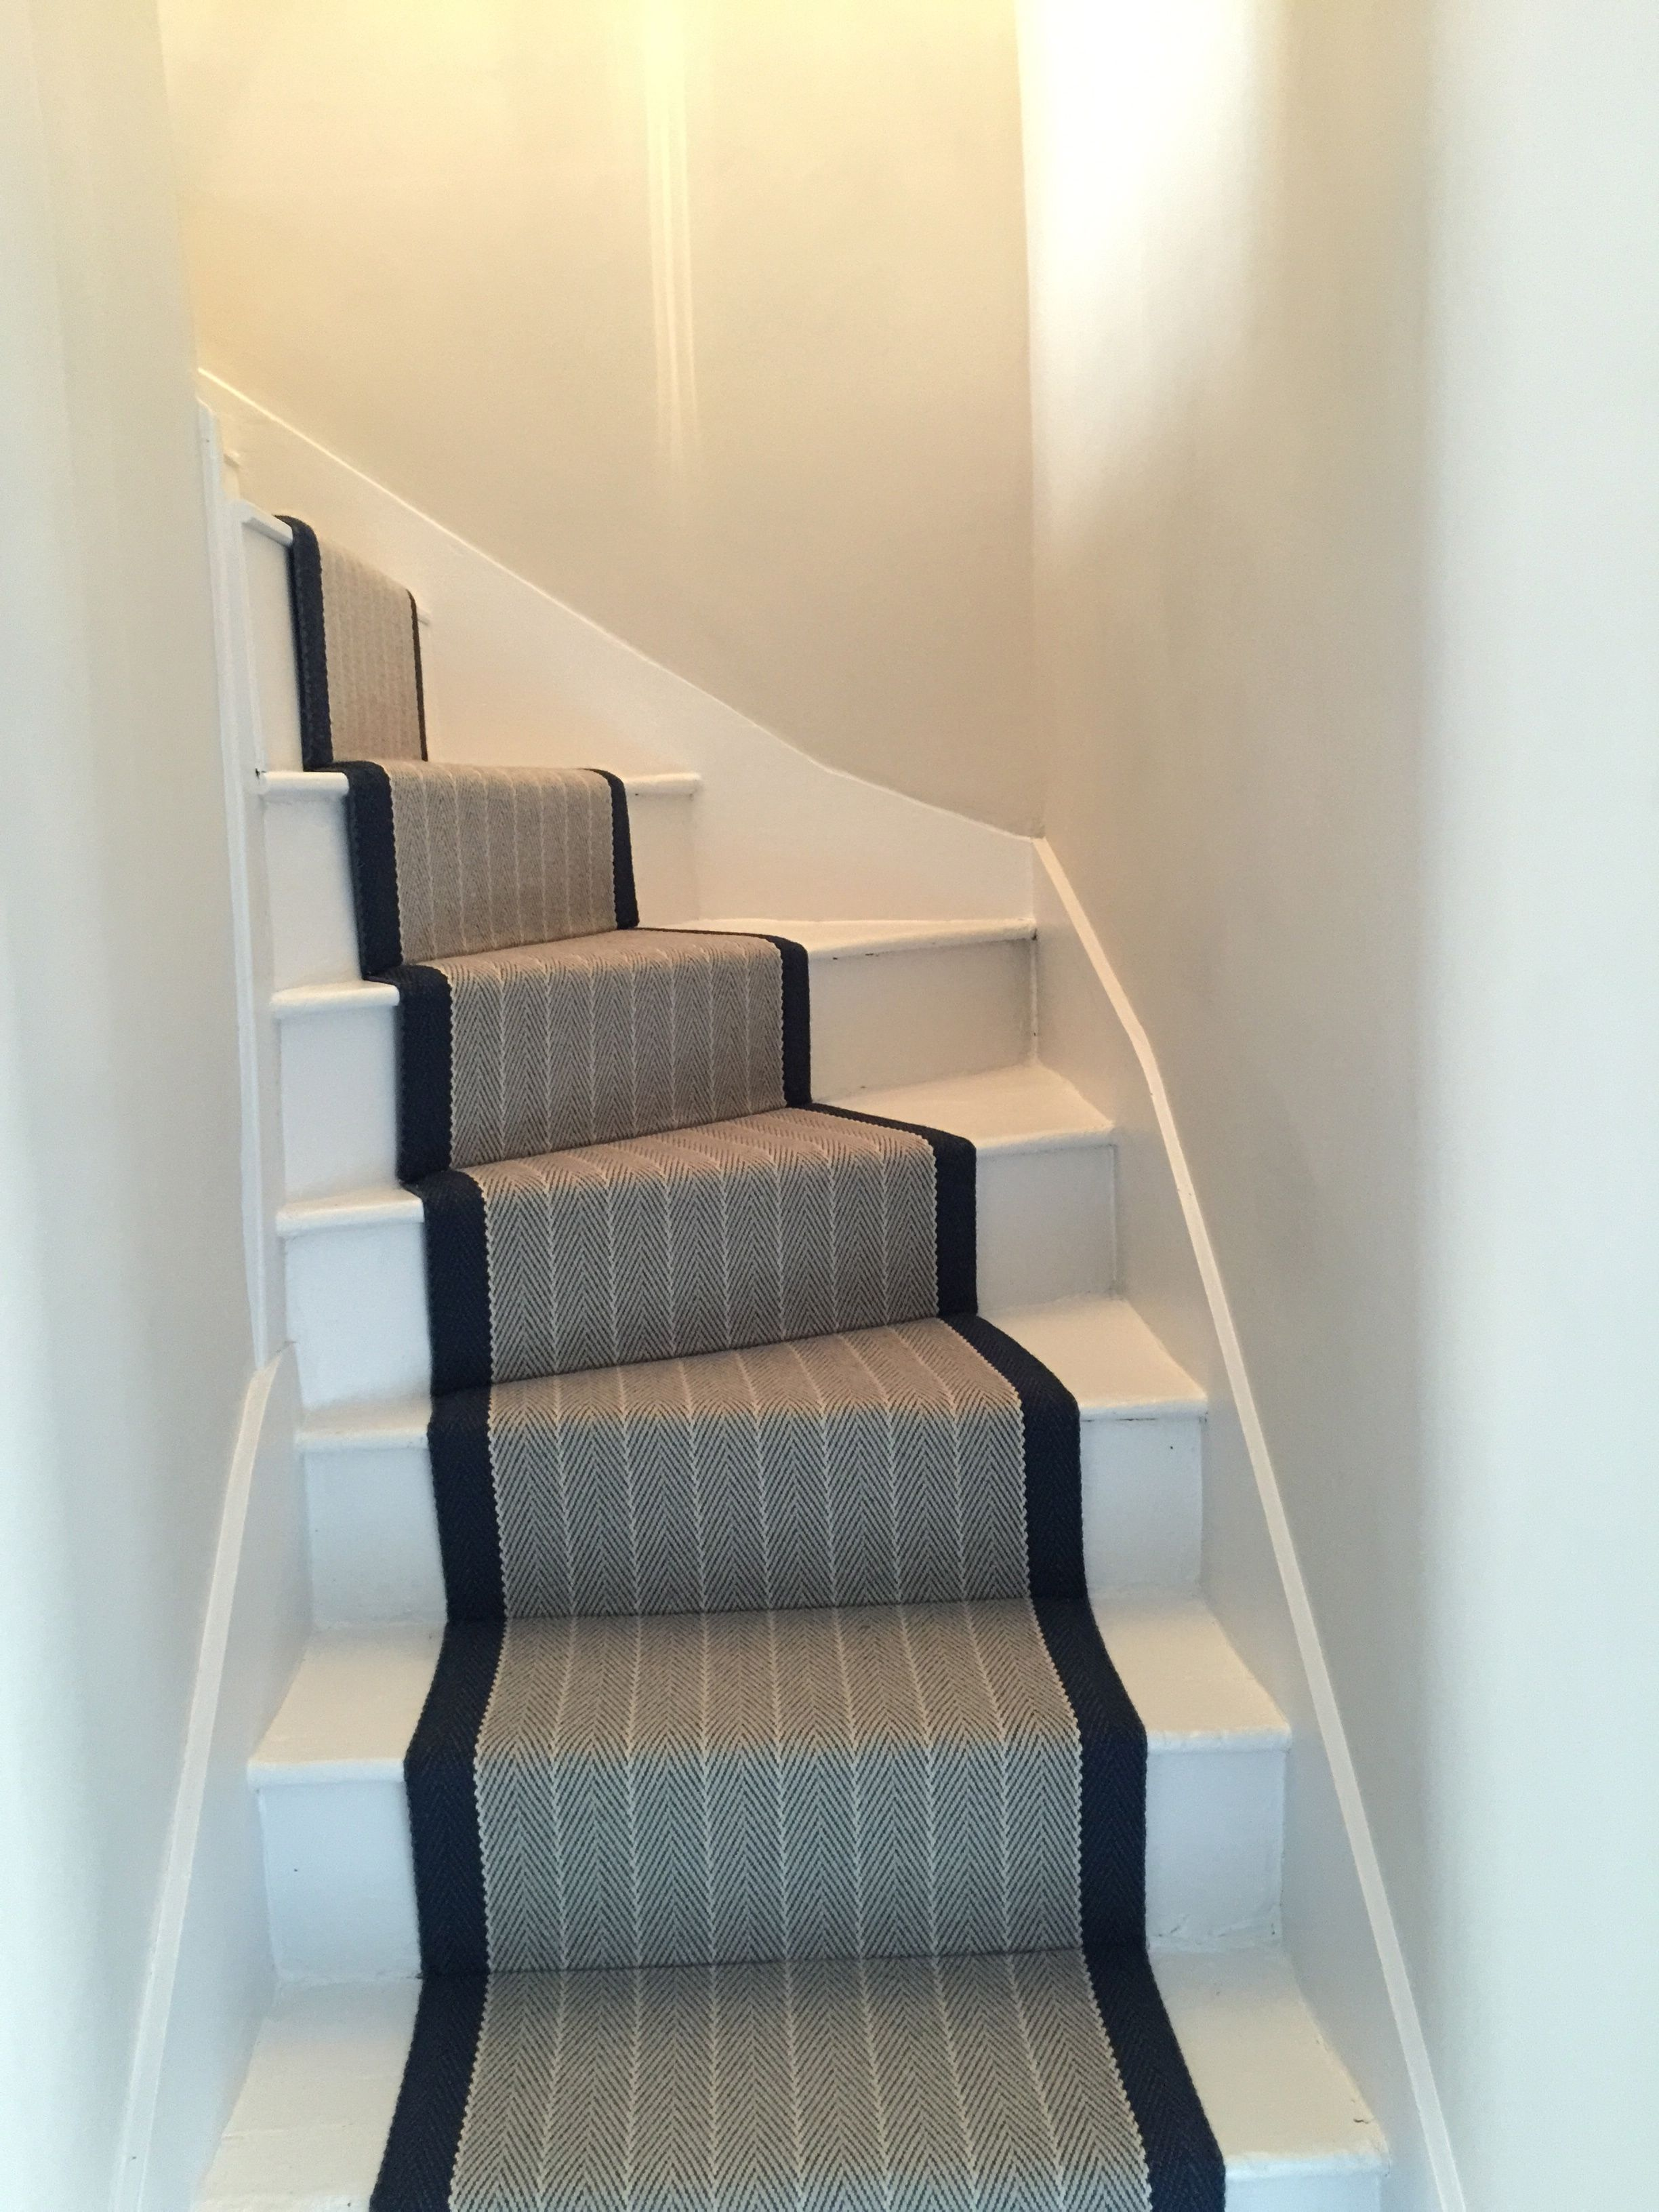 Best Roger Oates Stair Runner Stair Runner Stairs Hallway 400 x 300